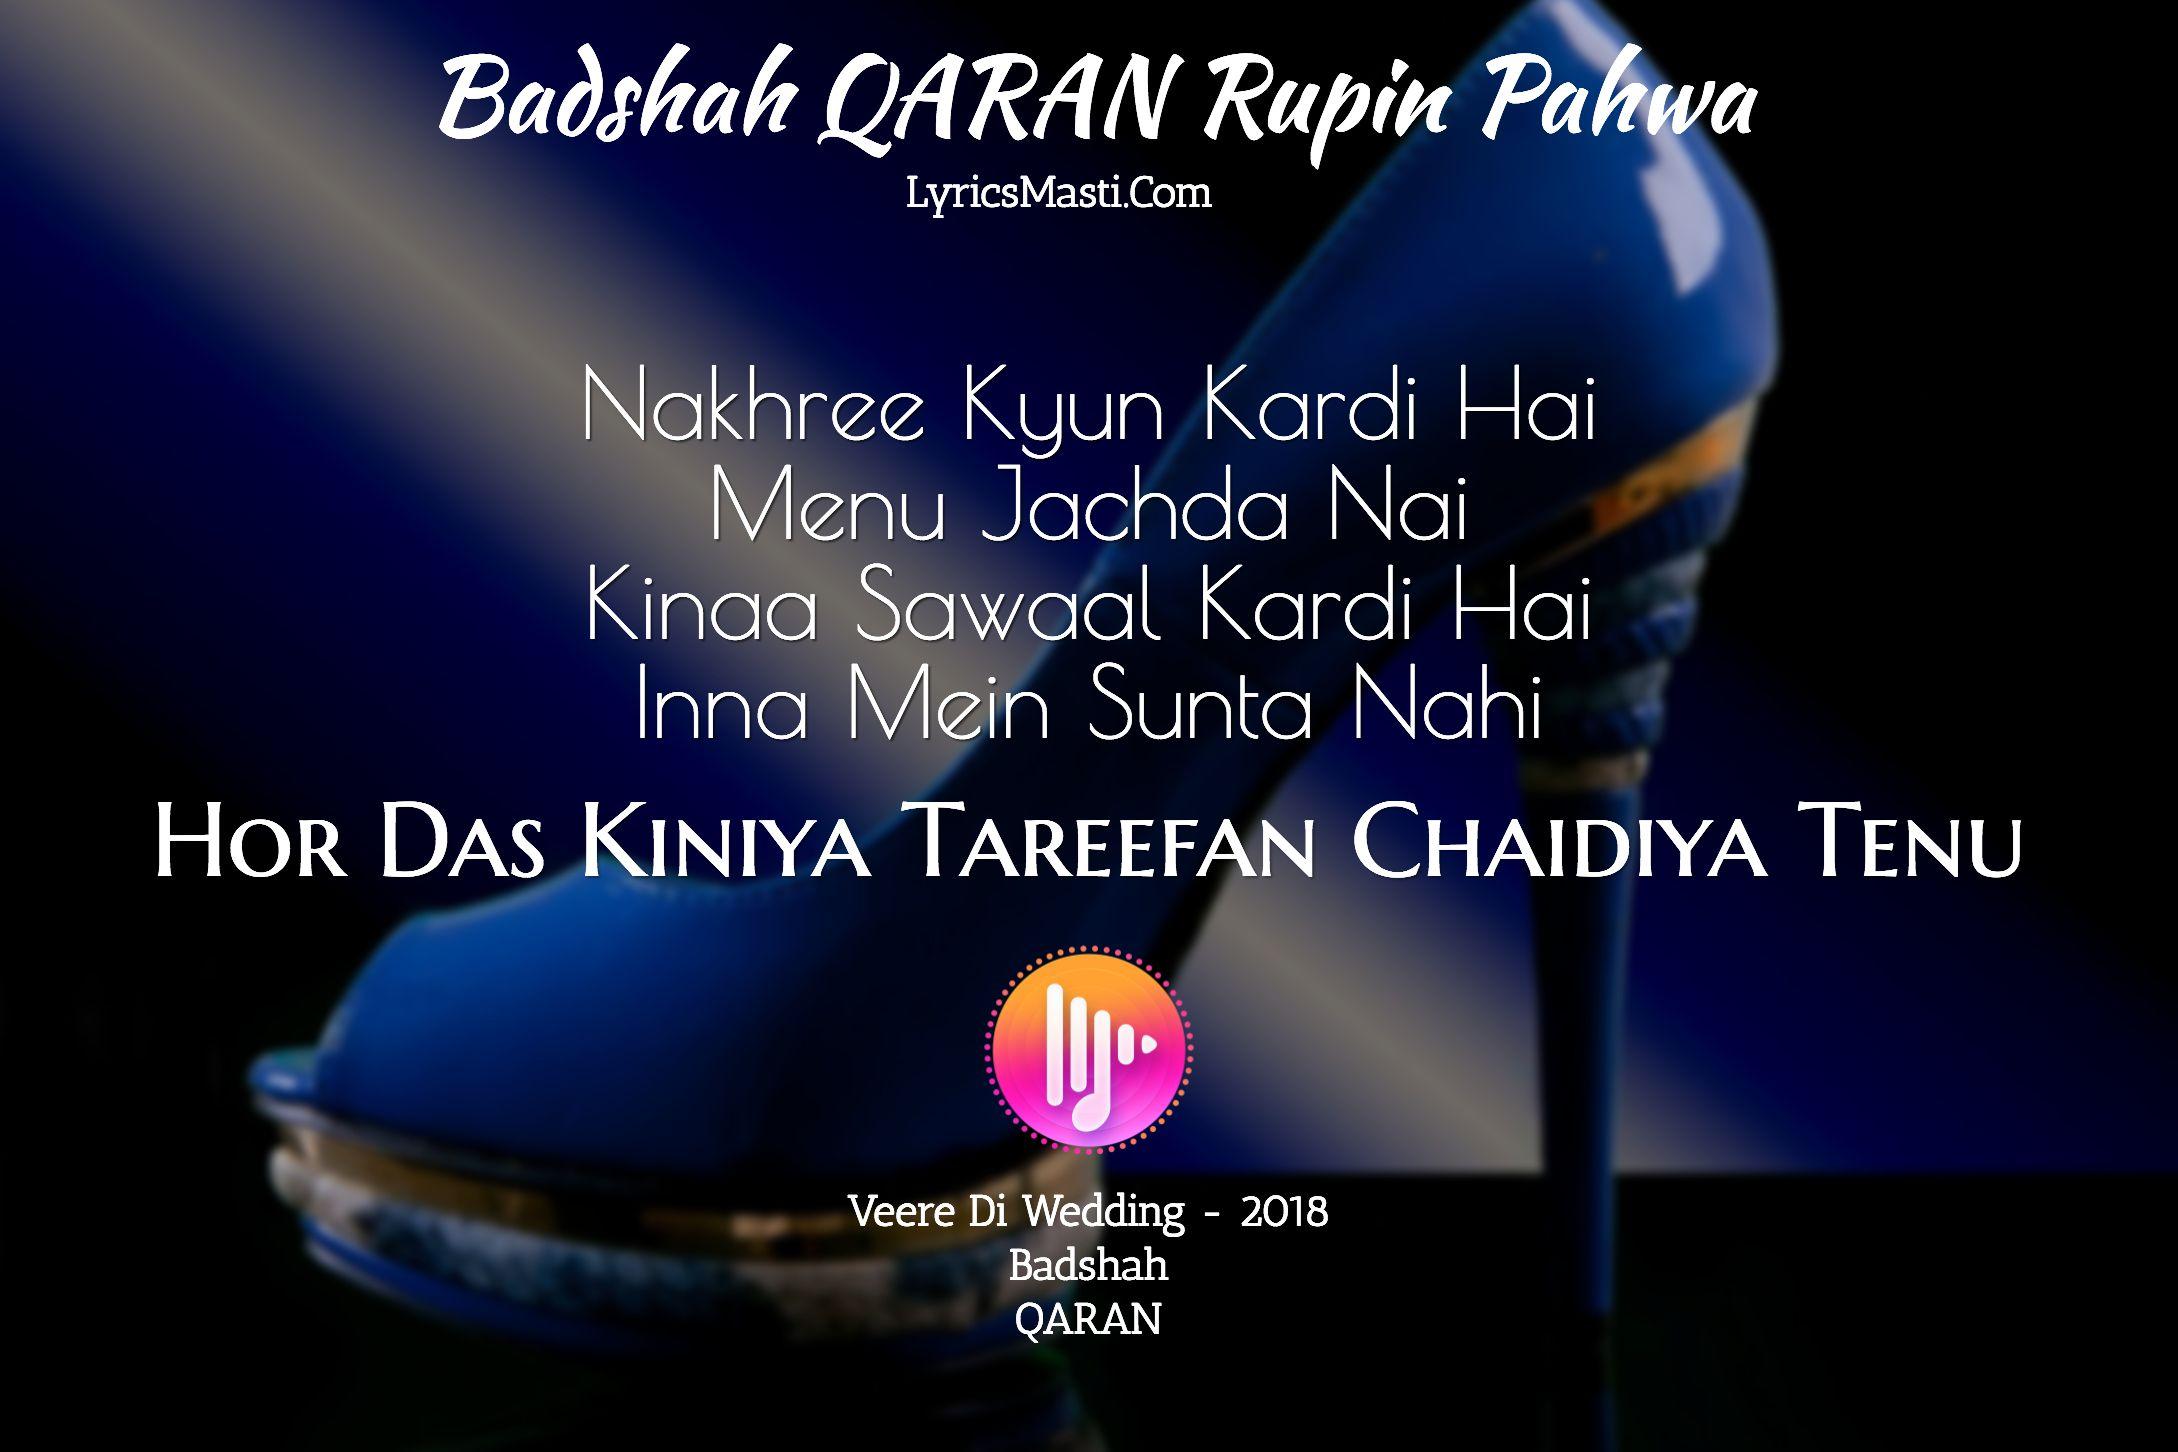 Best Nakhre Kyun Kardi Mainu Jachda Nahi Song - Bella Esa